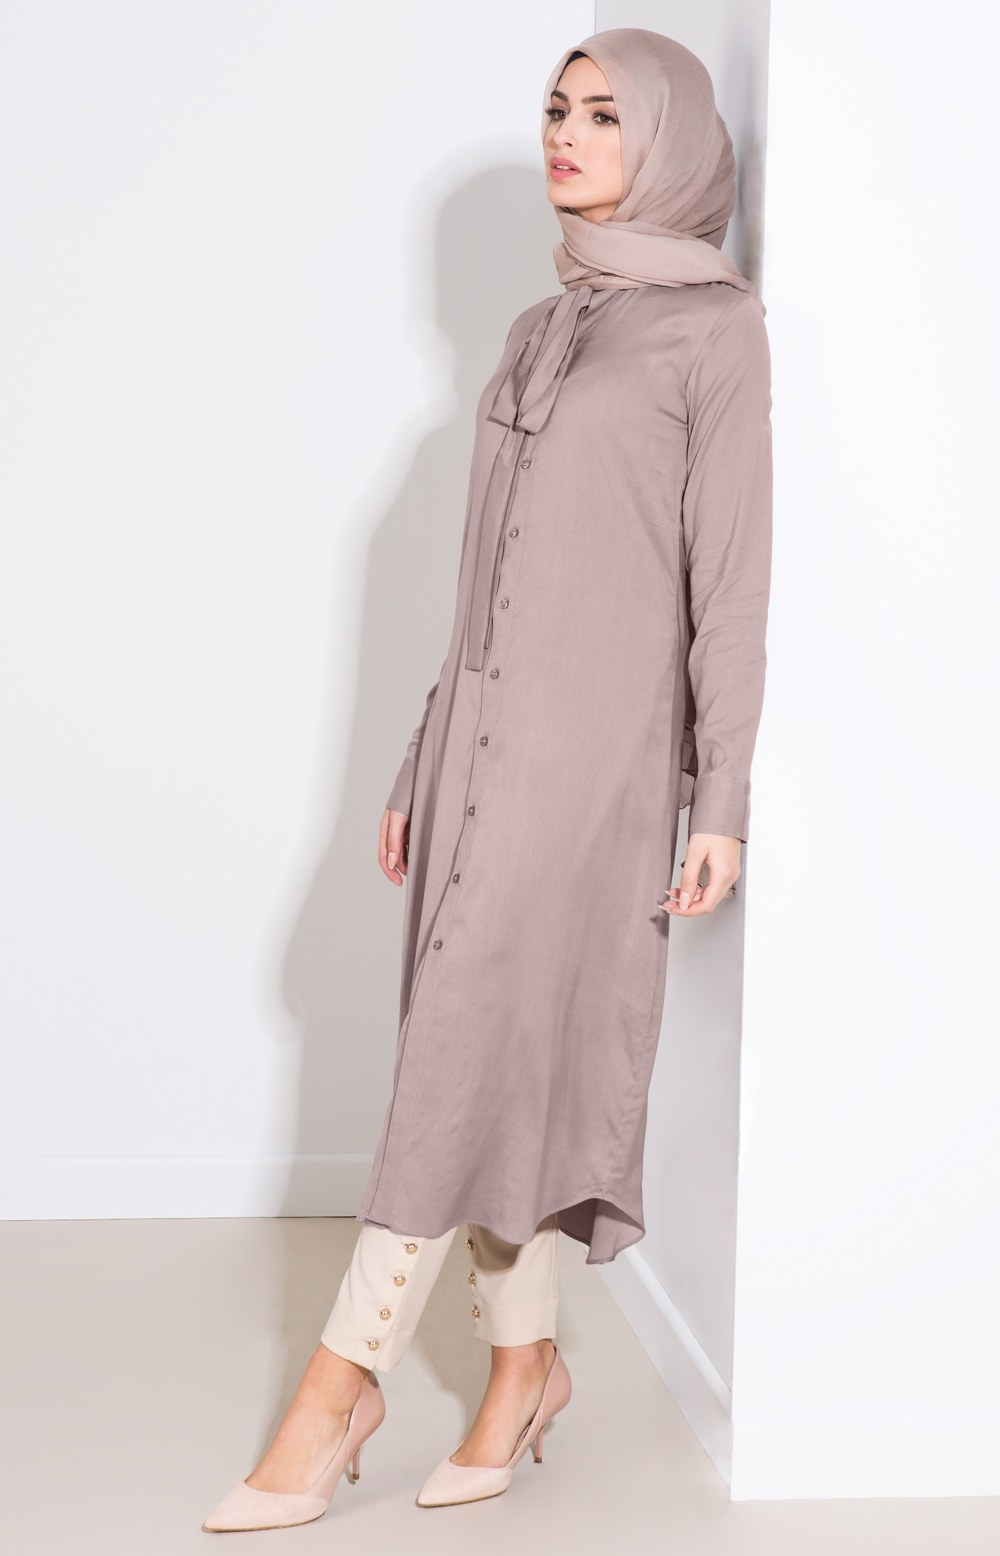 Inspirasi Model Model Baju Lebaran Q0d4 25 Trend Model Baju Muslim Lebaran 2018 Simple & Modis